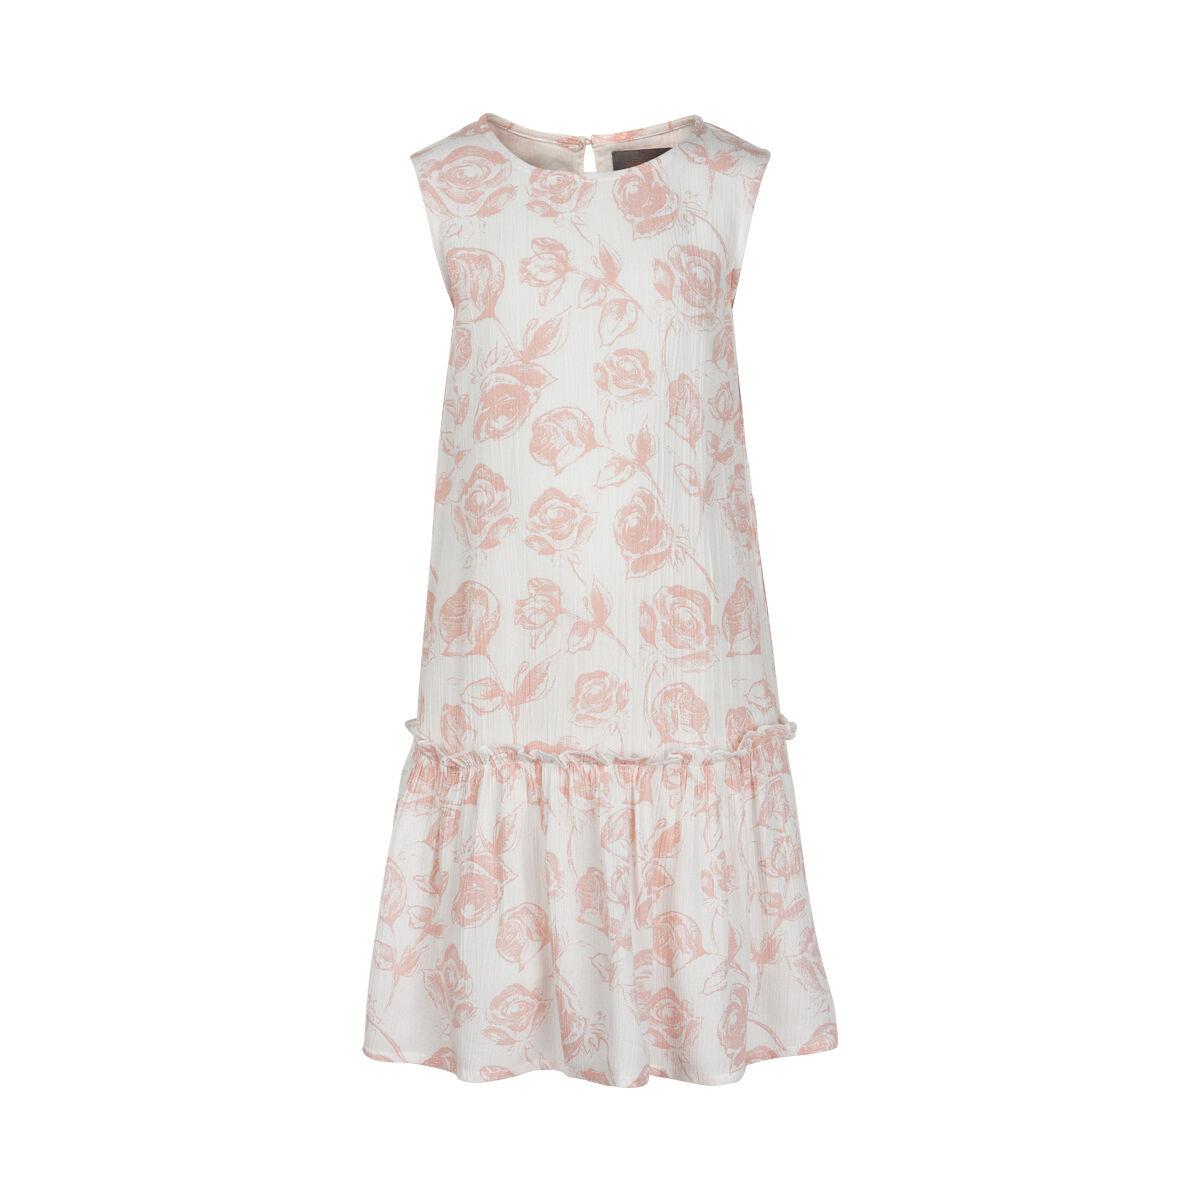 Creamie Dress w. Roses